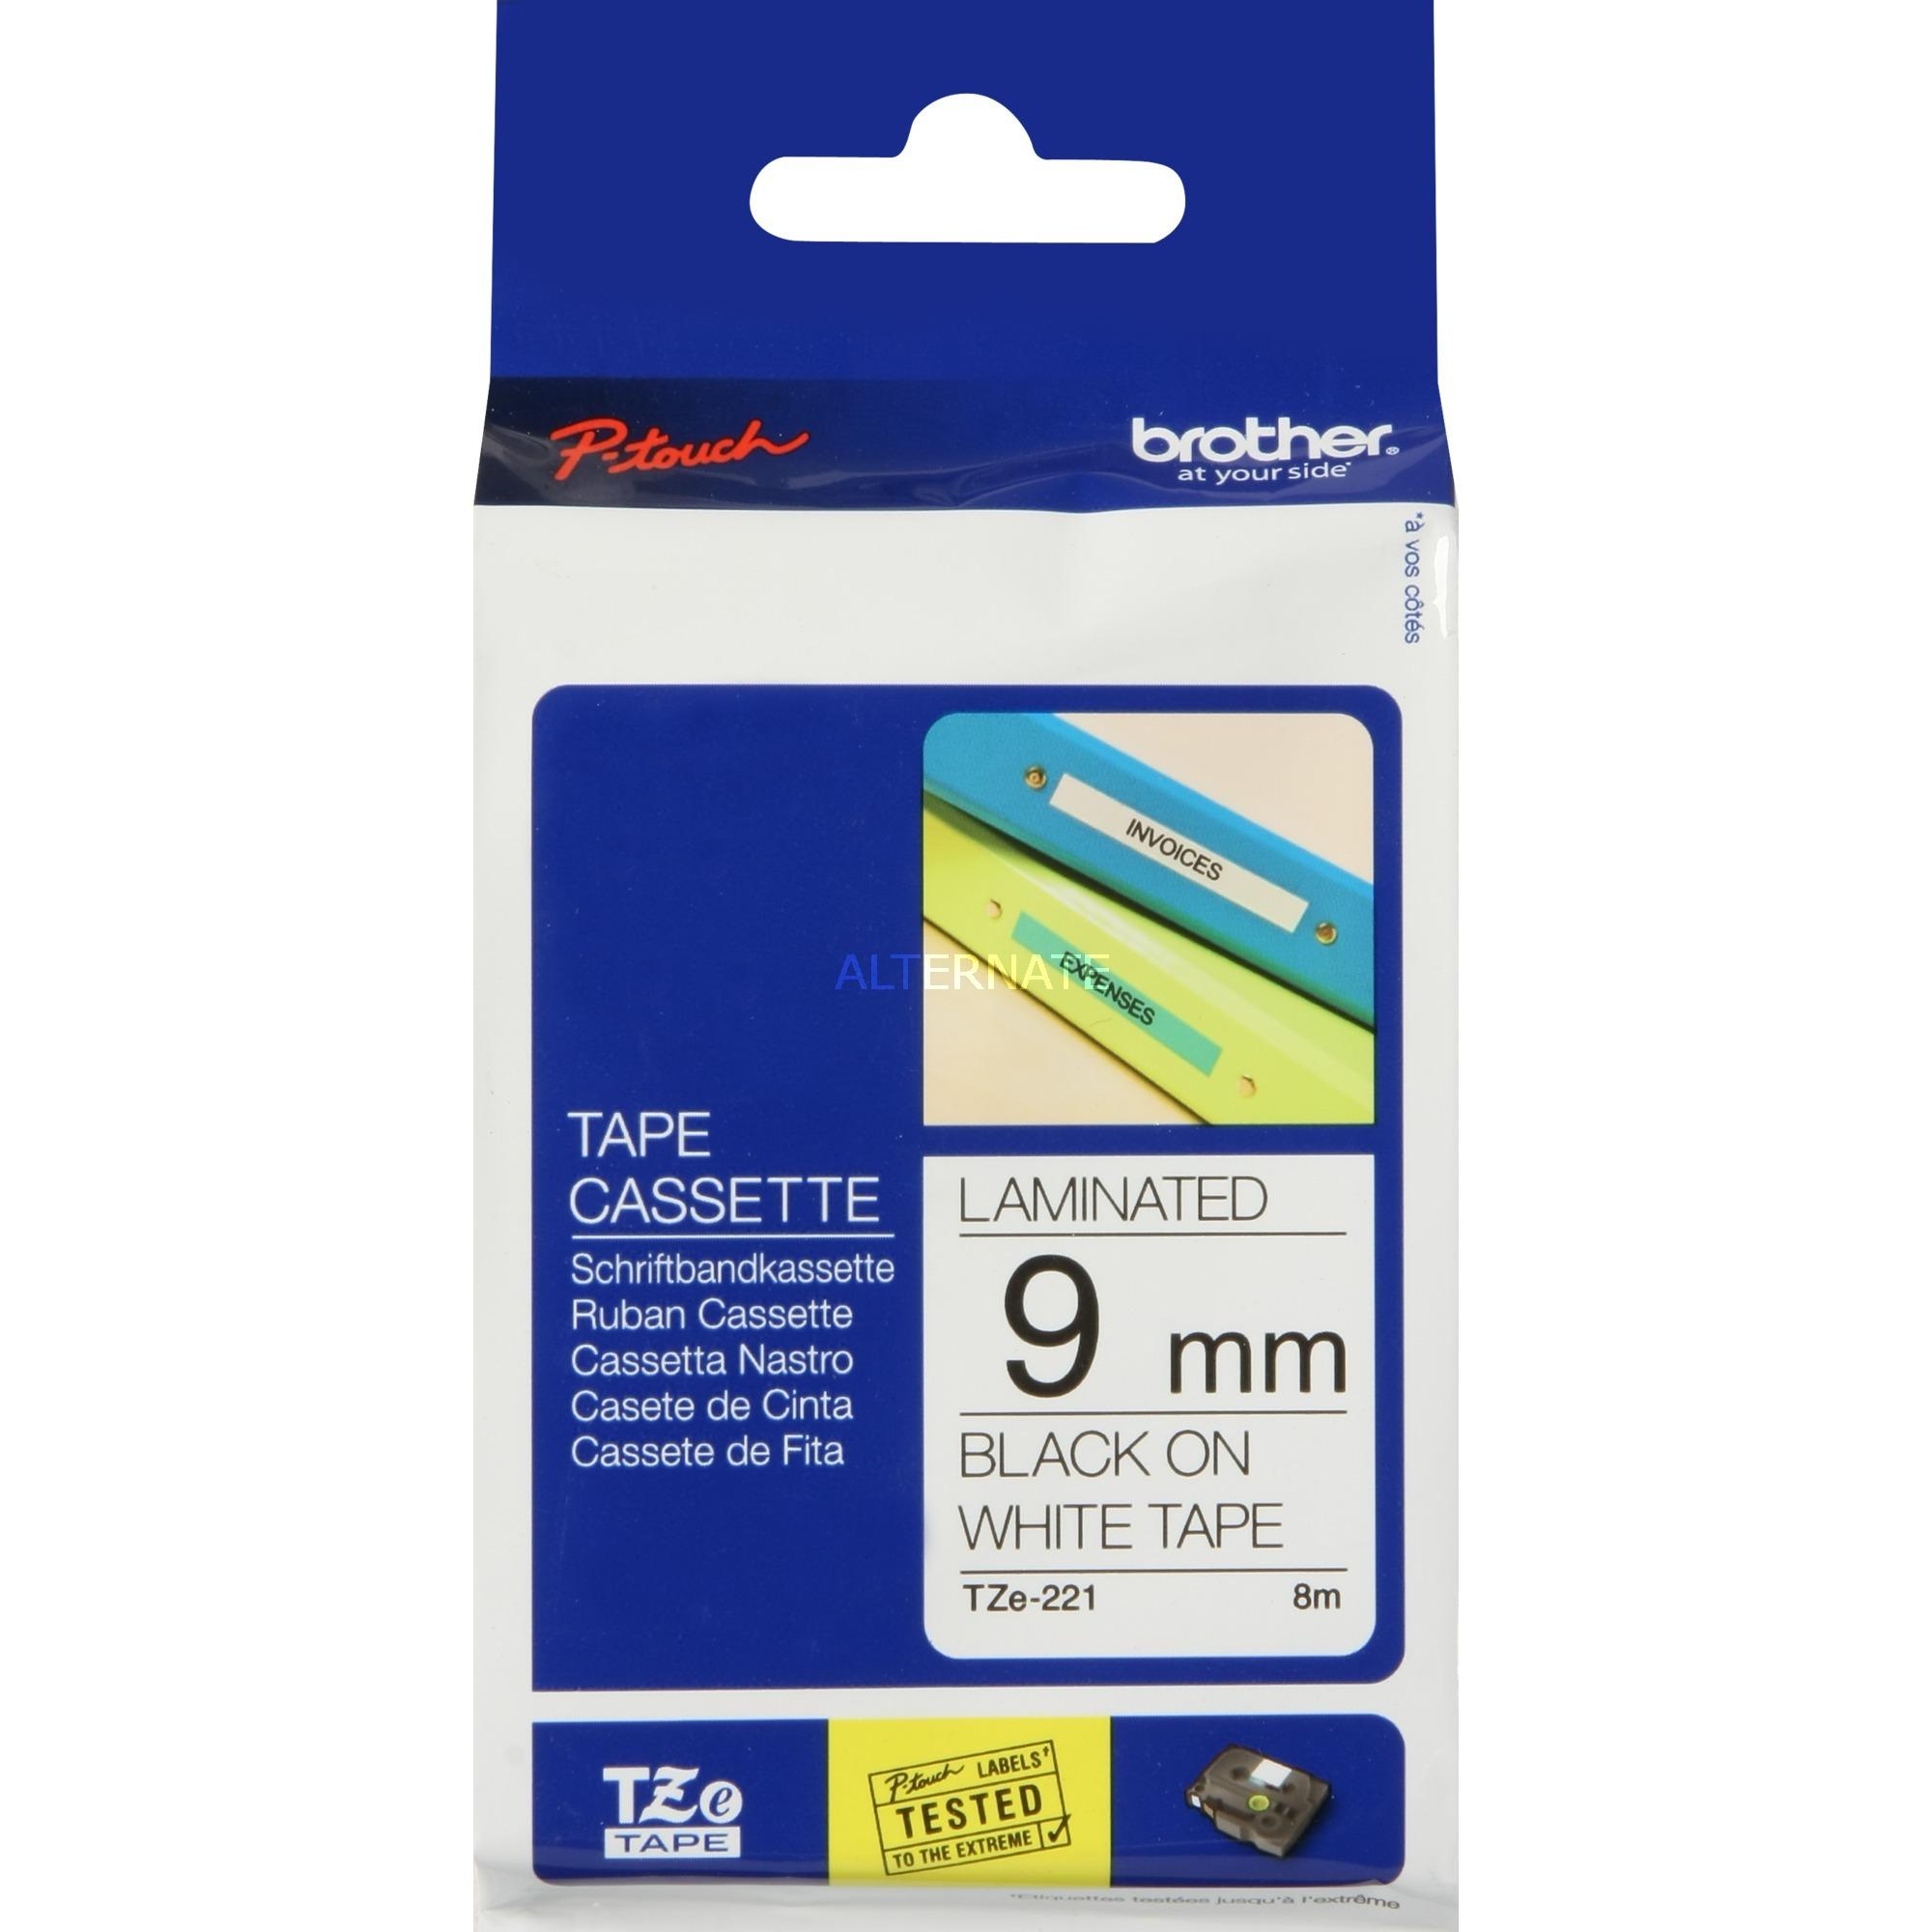 Black on White Gloss Laminated Tape, 9mm TZ cinta para impresora de etiquetas, Cinta de escritura